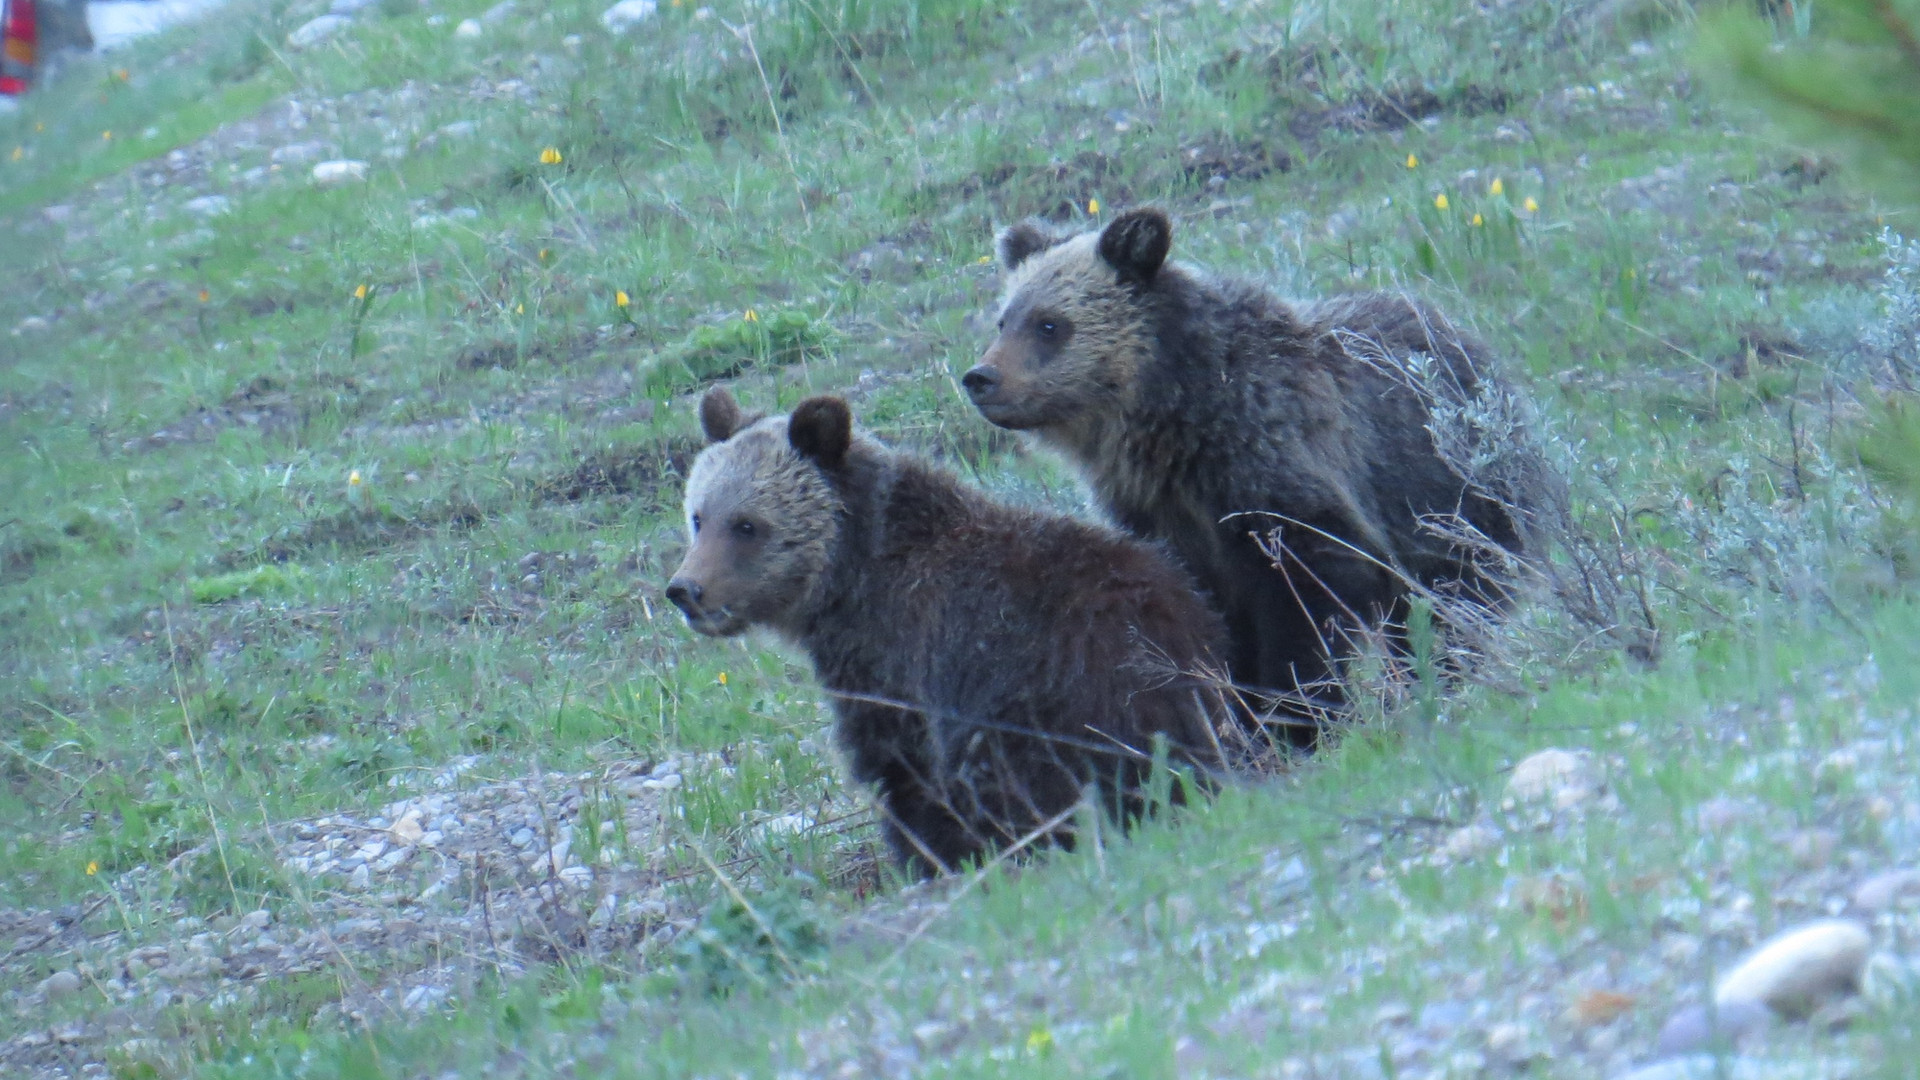 grand-teton-national-park-Tour-Grizzly-B